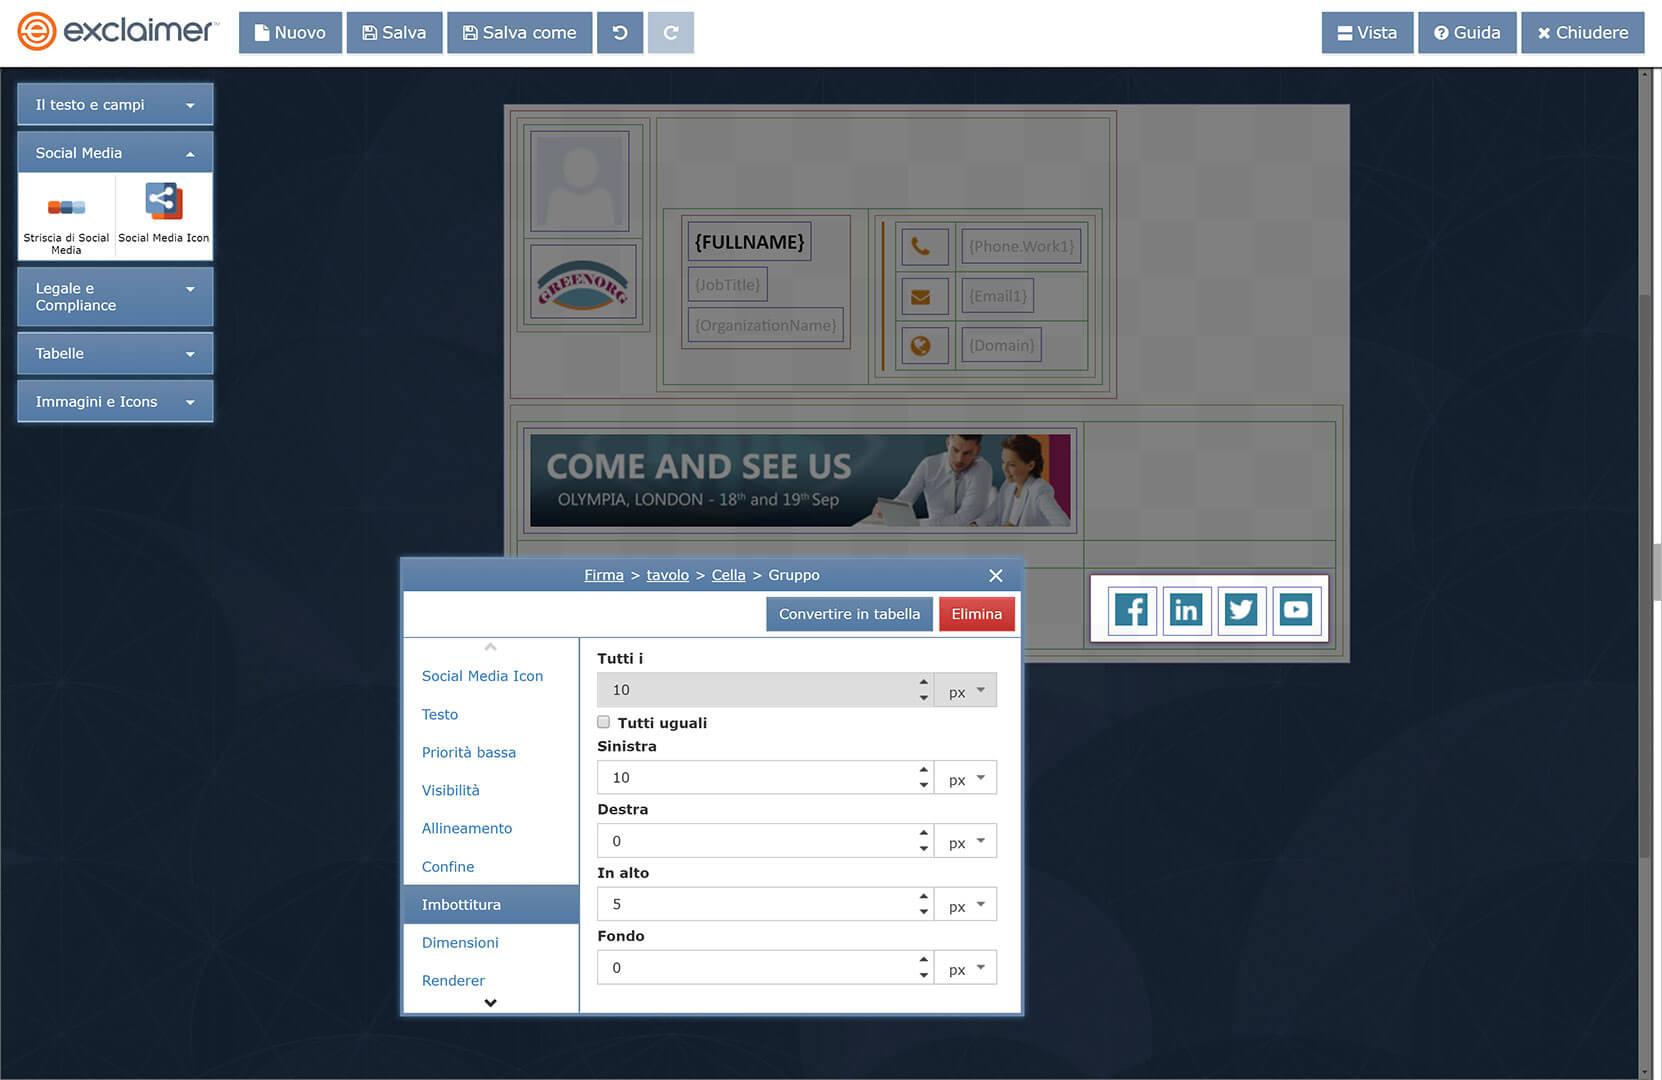 Nessuna competenza in HTML per creare firme Gmail aziendali.